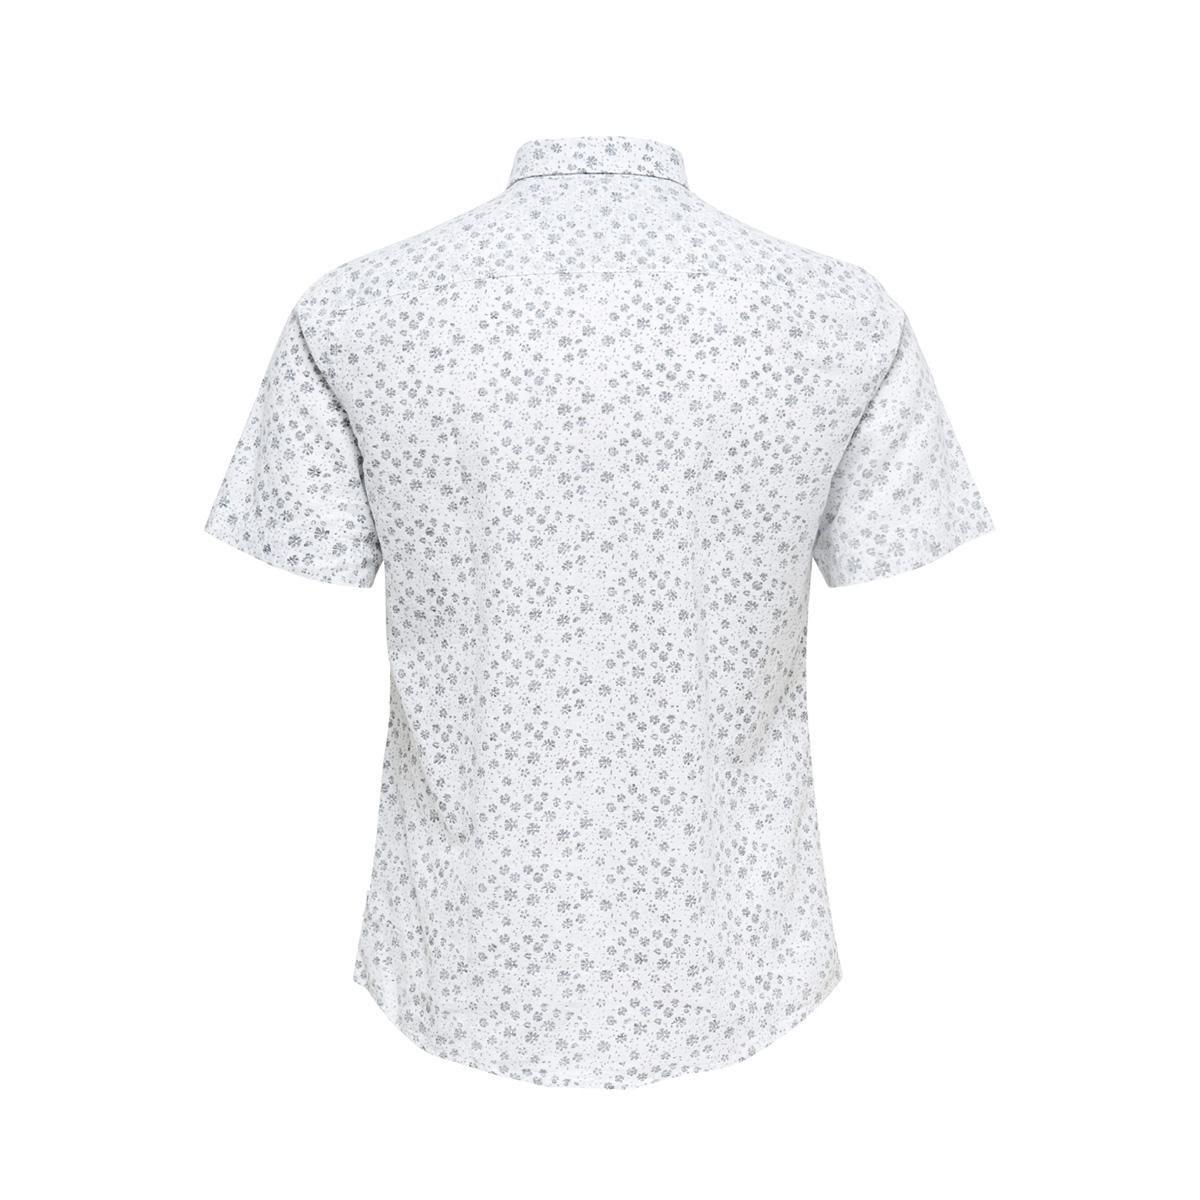 onscaiden ss aop linen shirt re 22012661 only & sons overhemd white